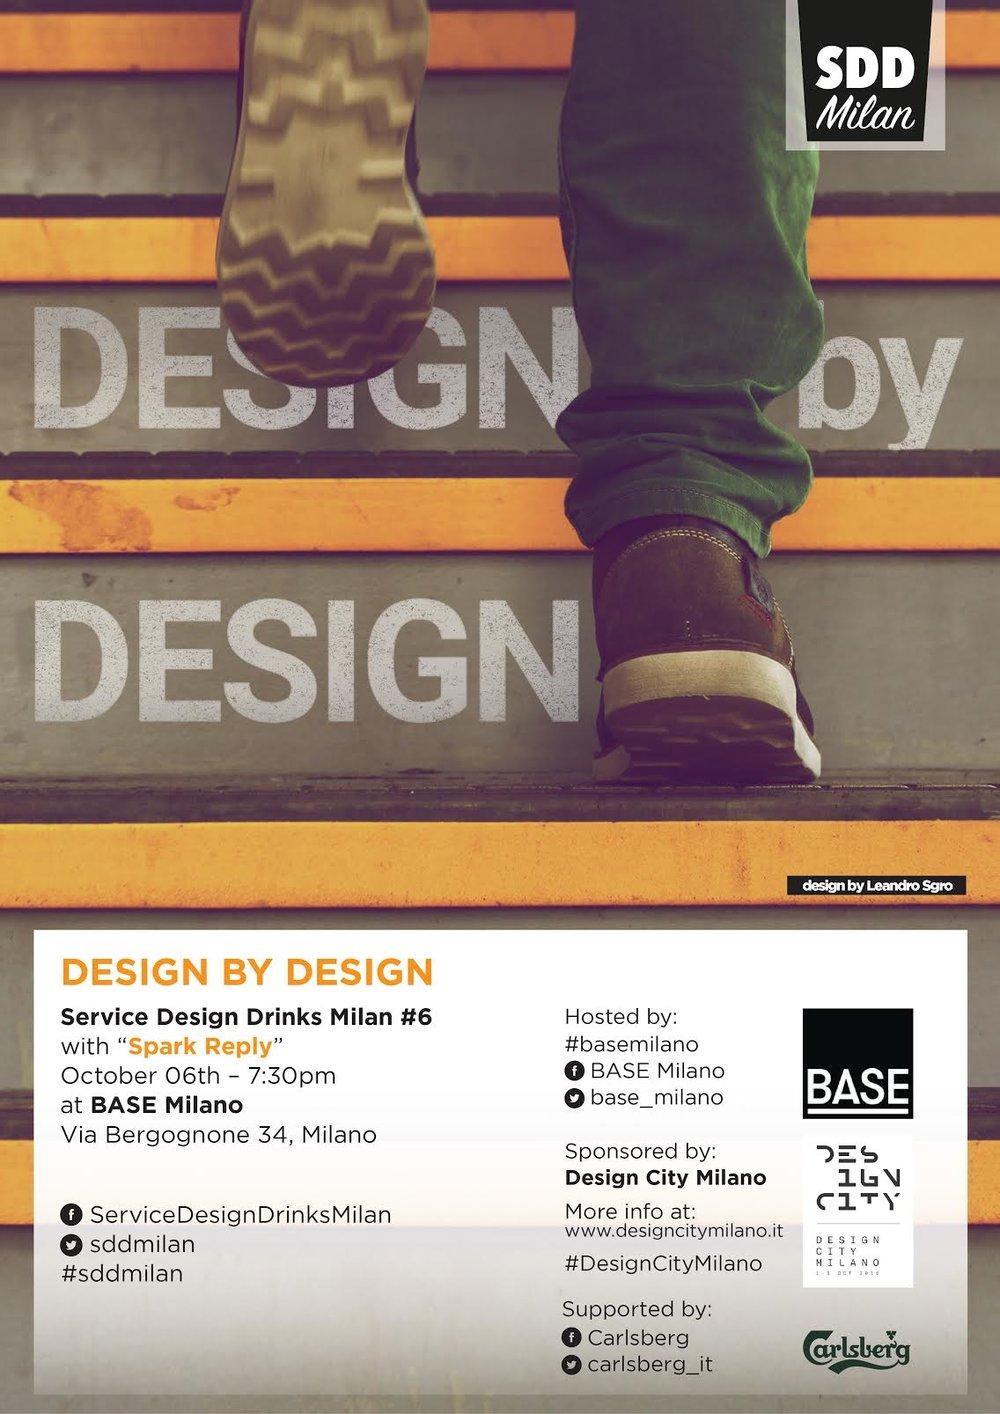 Service Design Drinks Milan #6 - Design by design.jpeg